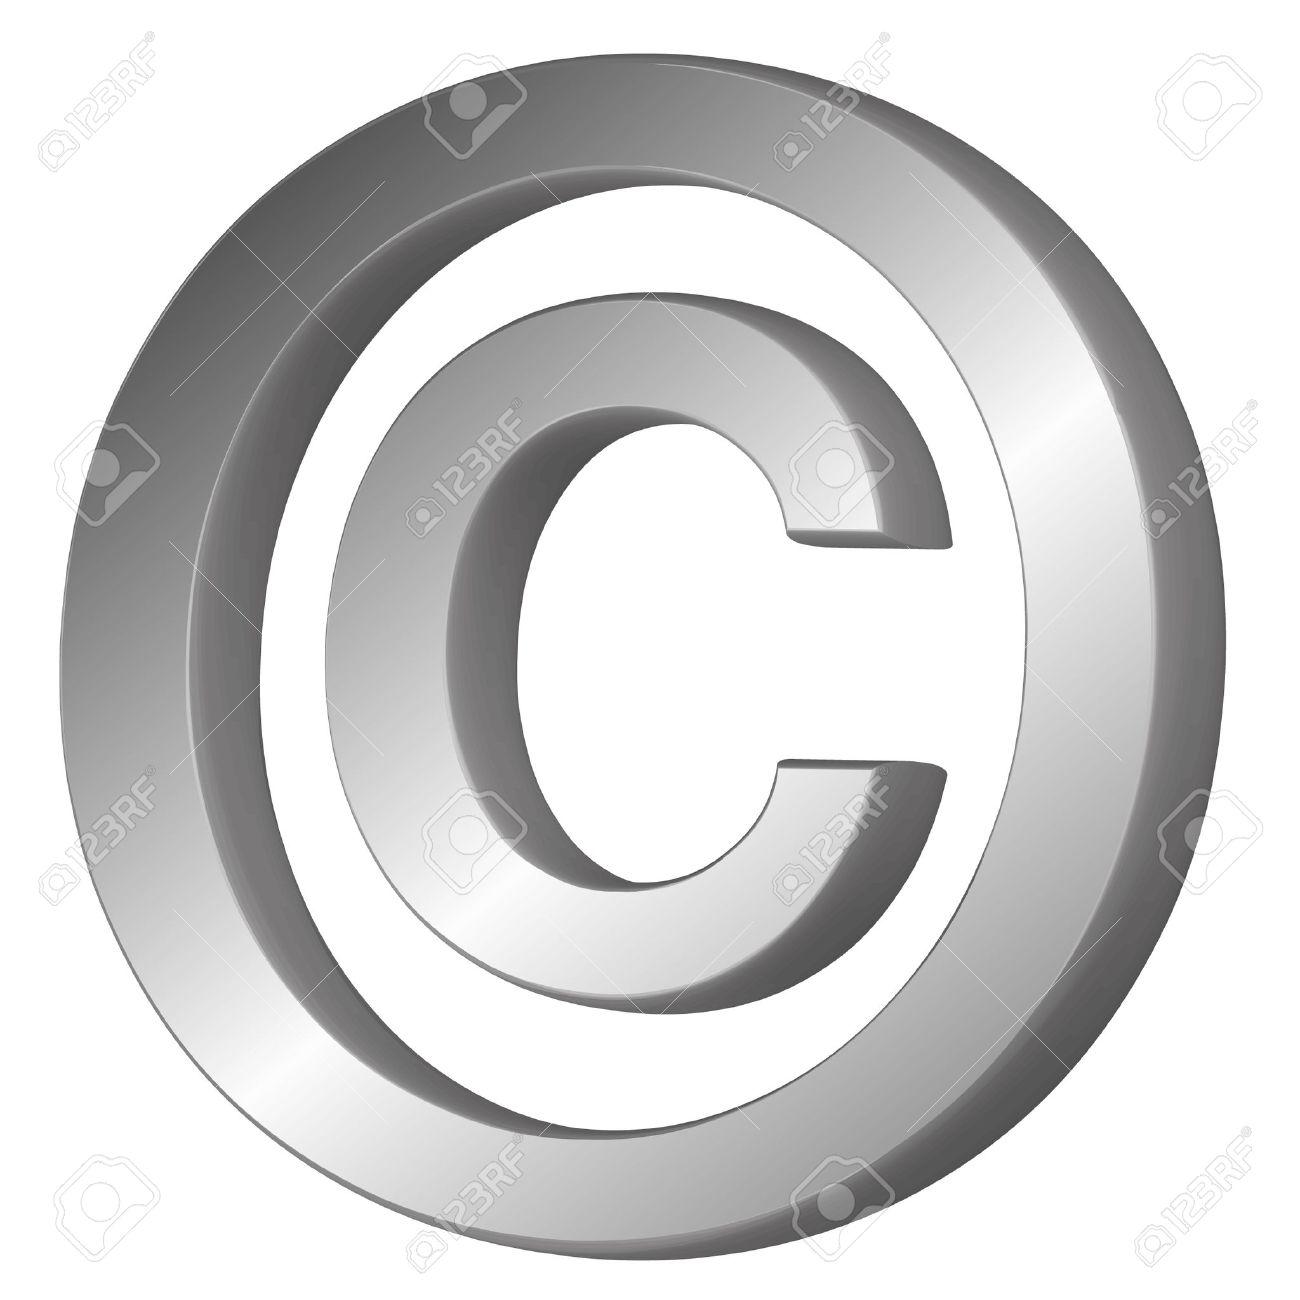 3d vector illustration of the copyright symbol royalty free 3d vector illustration of the copyright symbol stock vector 8176691 biocorpaavc